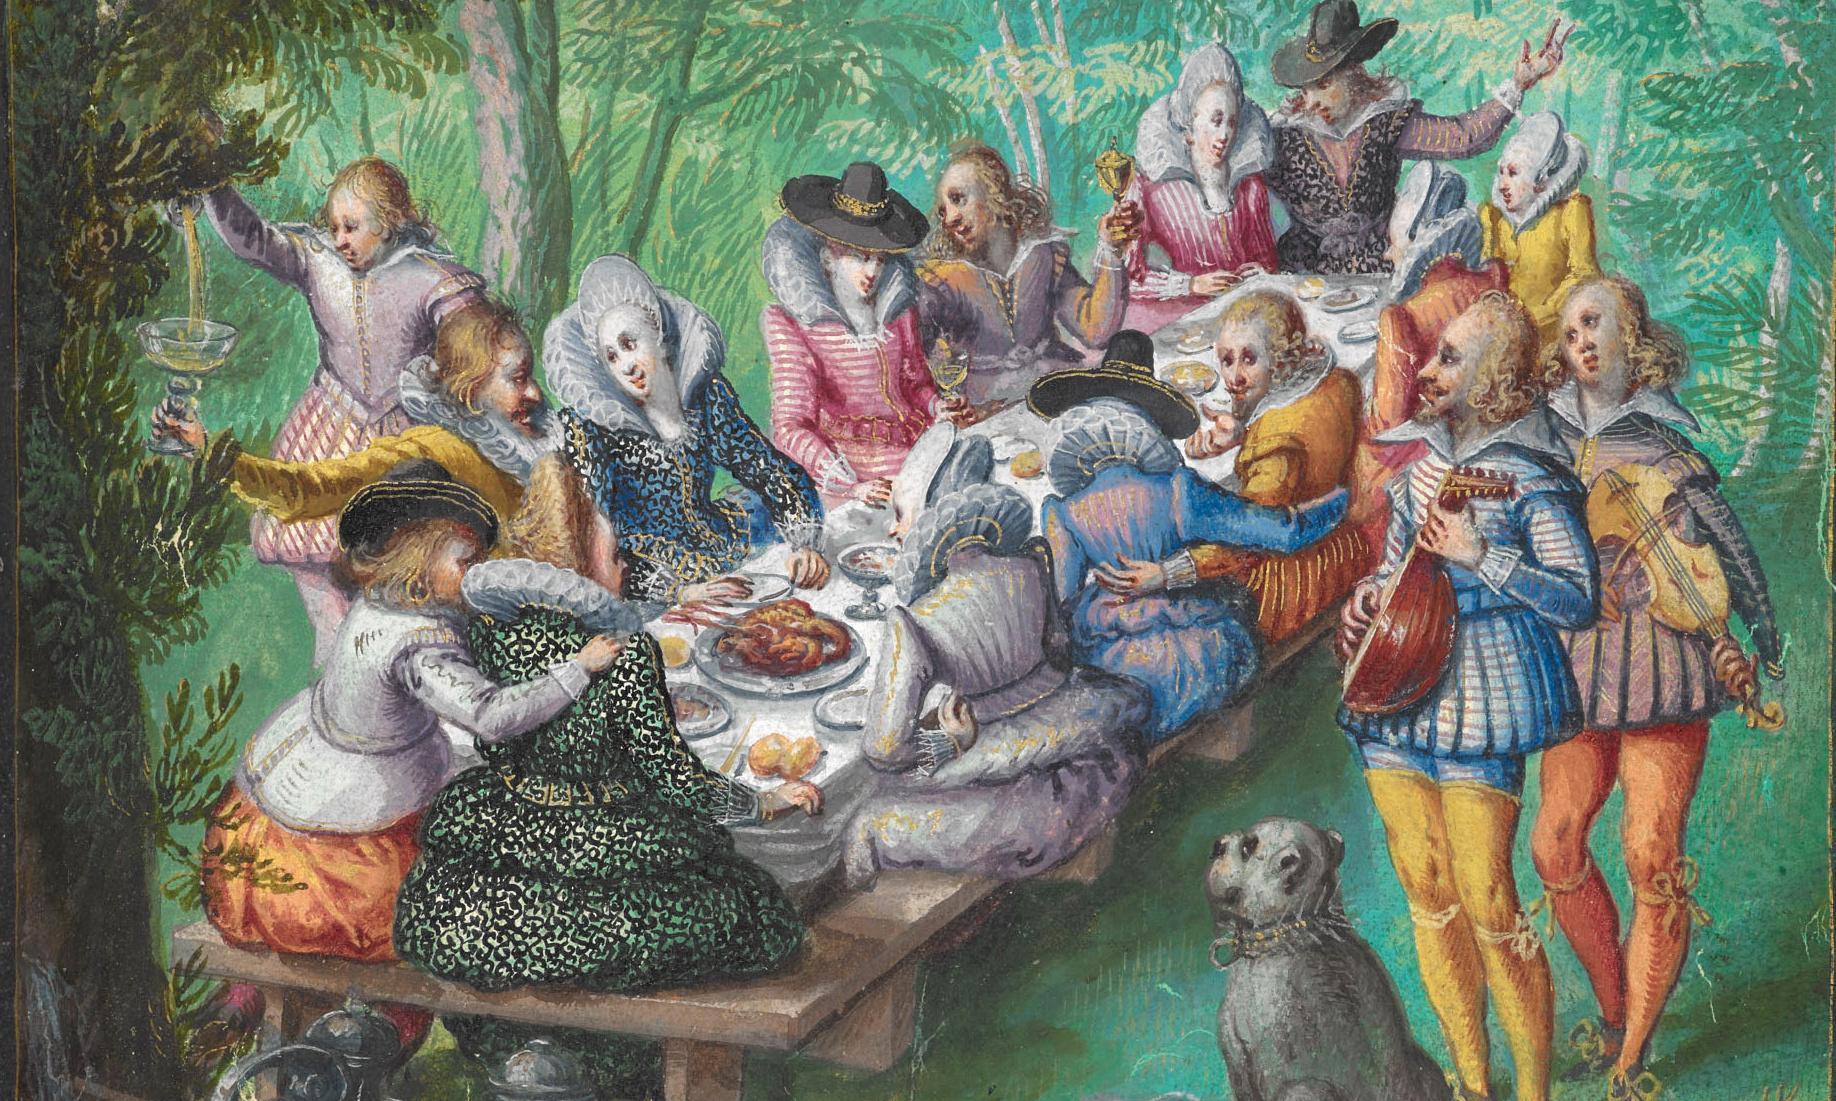 Alba amicorum: the original Facebook for Renaissance teens?